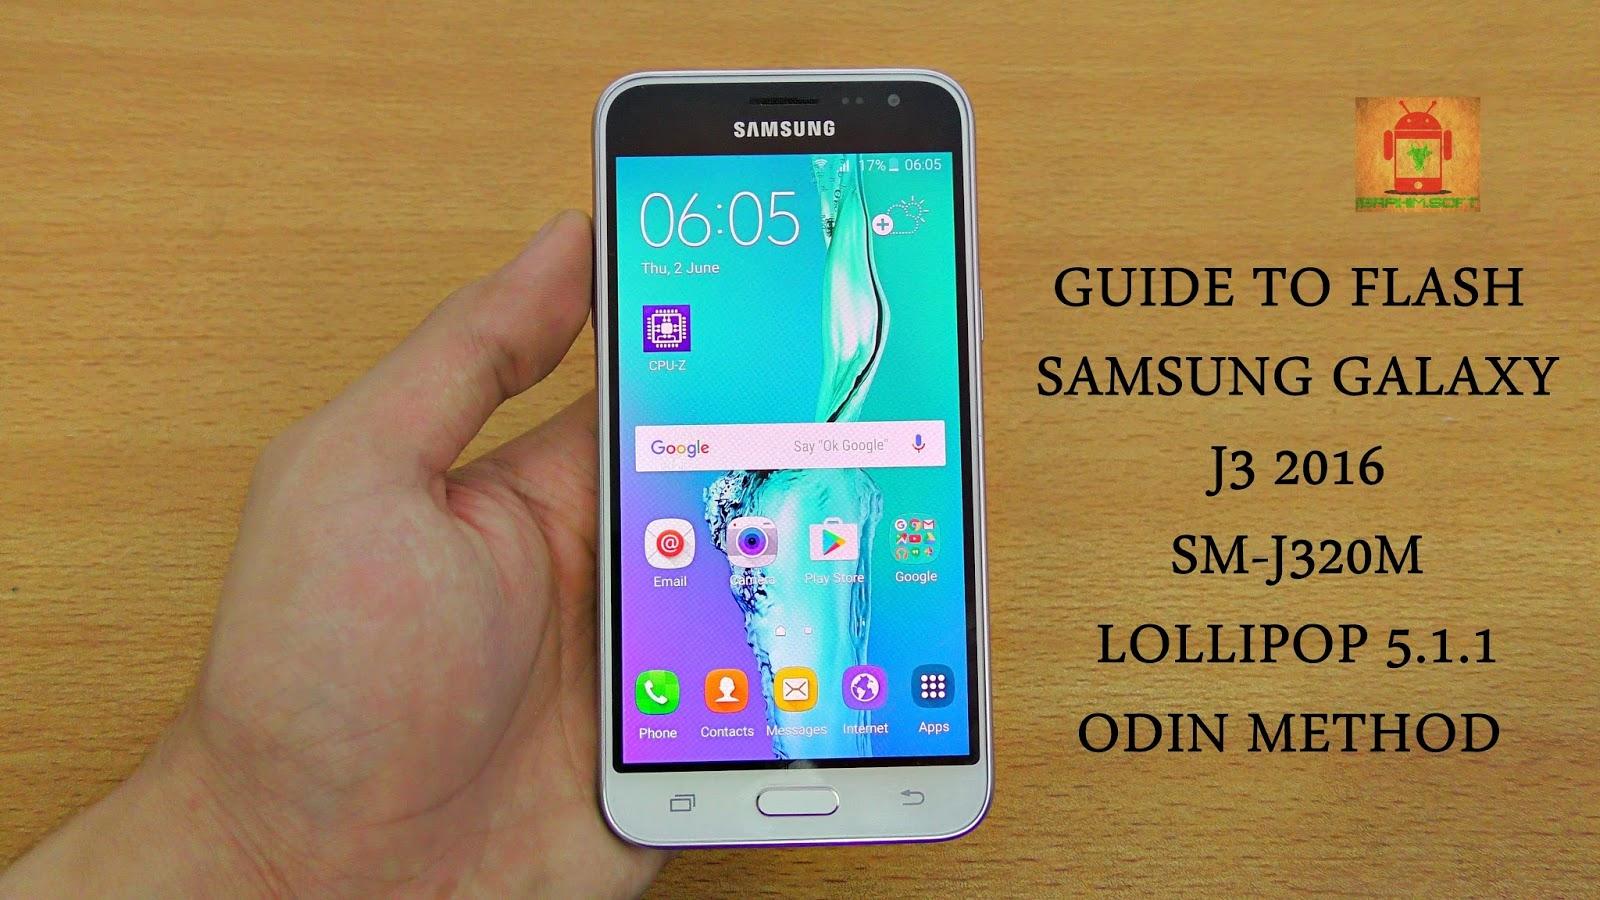 Guide To Flash Samsung Galaxy J3 2016 SM-J320M Lollipop 5 1